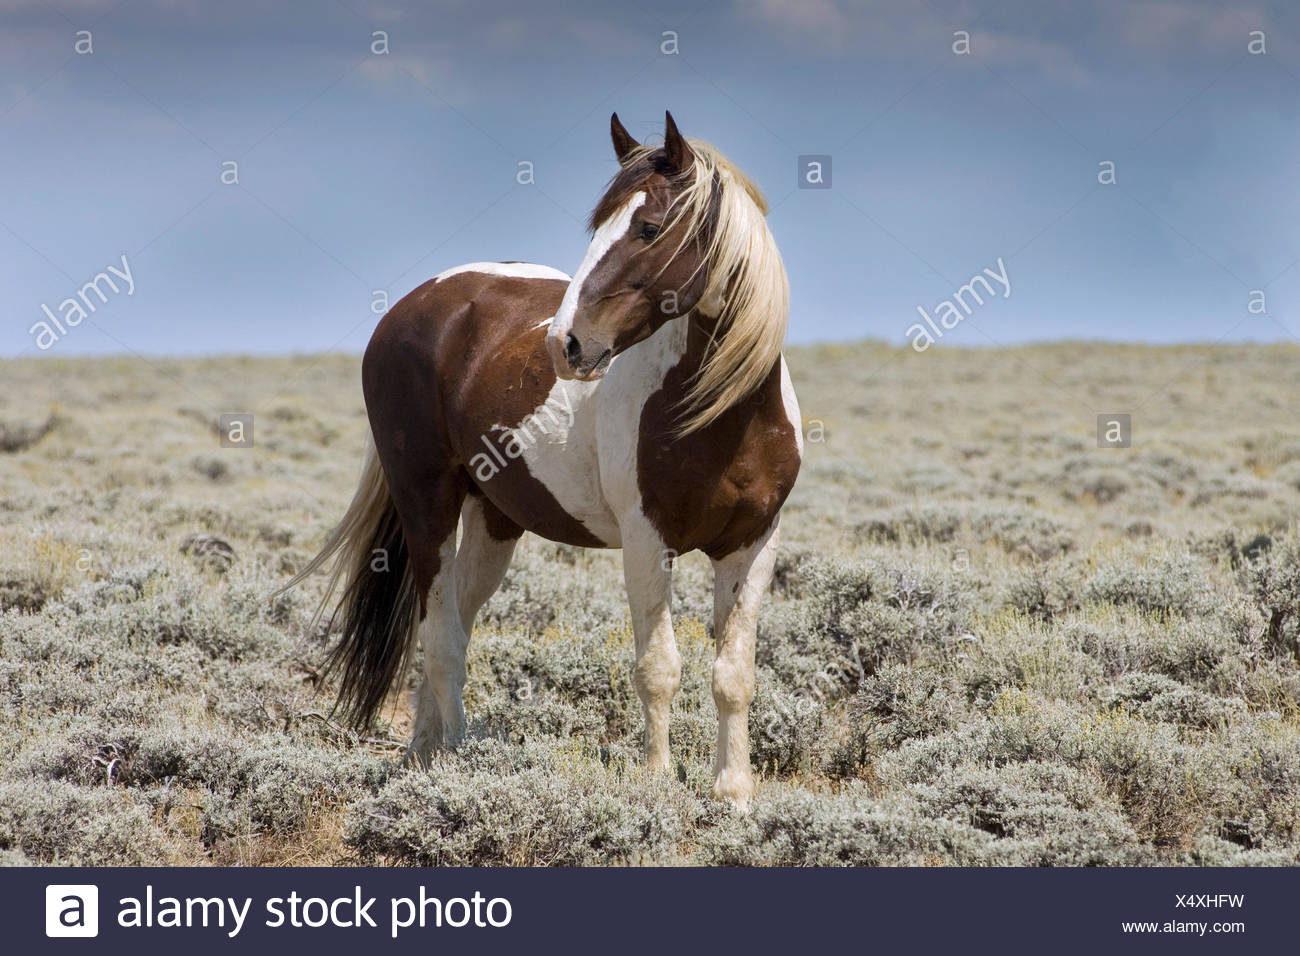 Mustang (Equus ferus caballus), stallion, piebald standing in prairie, Wyoming, USA - Stock Image